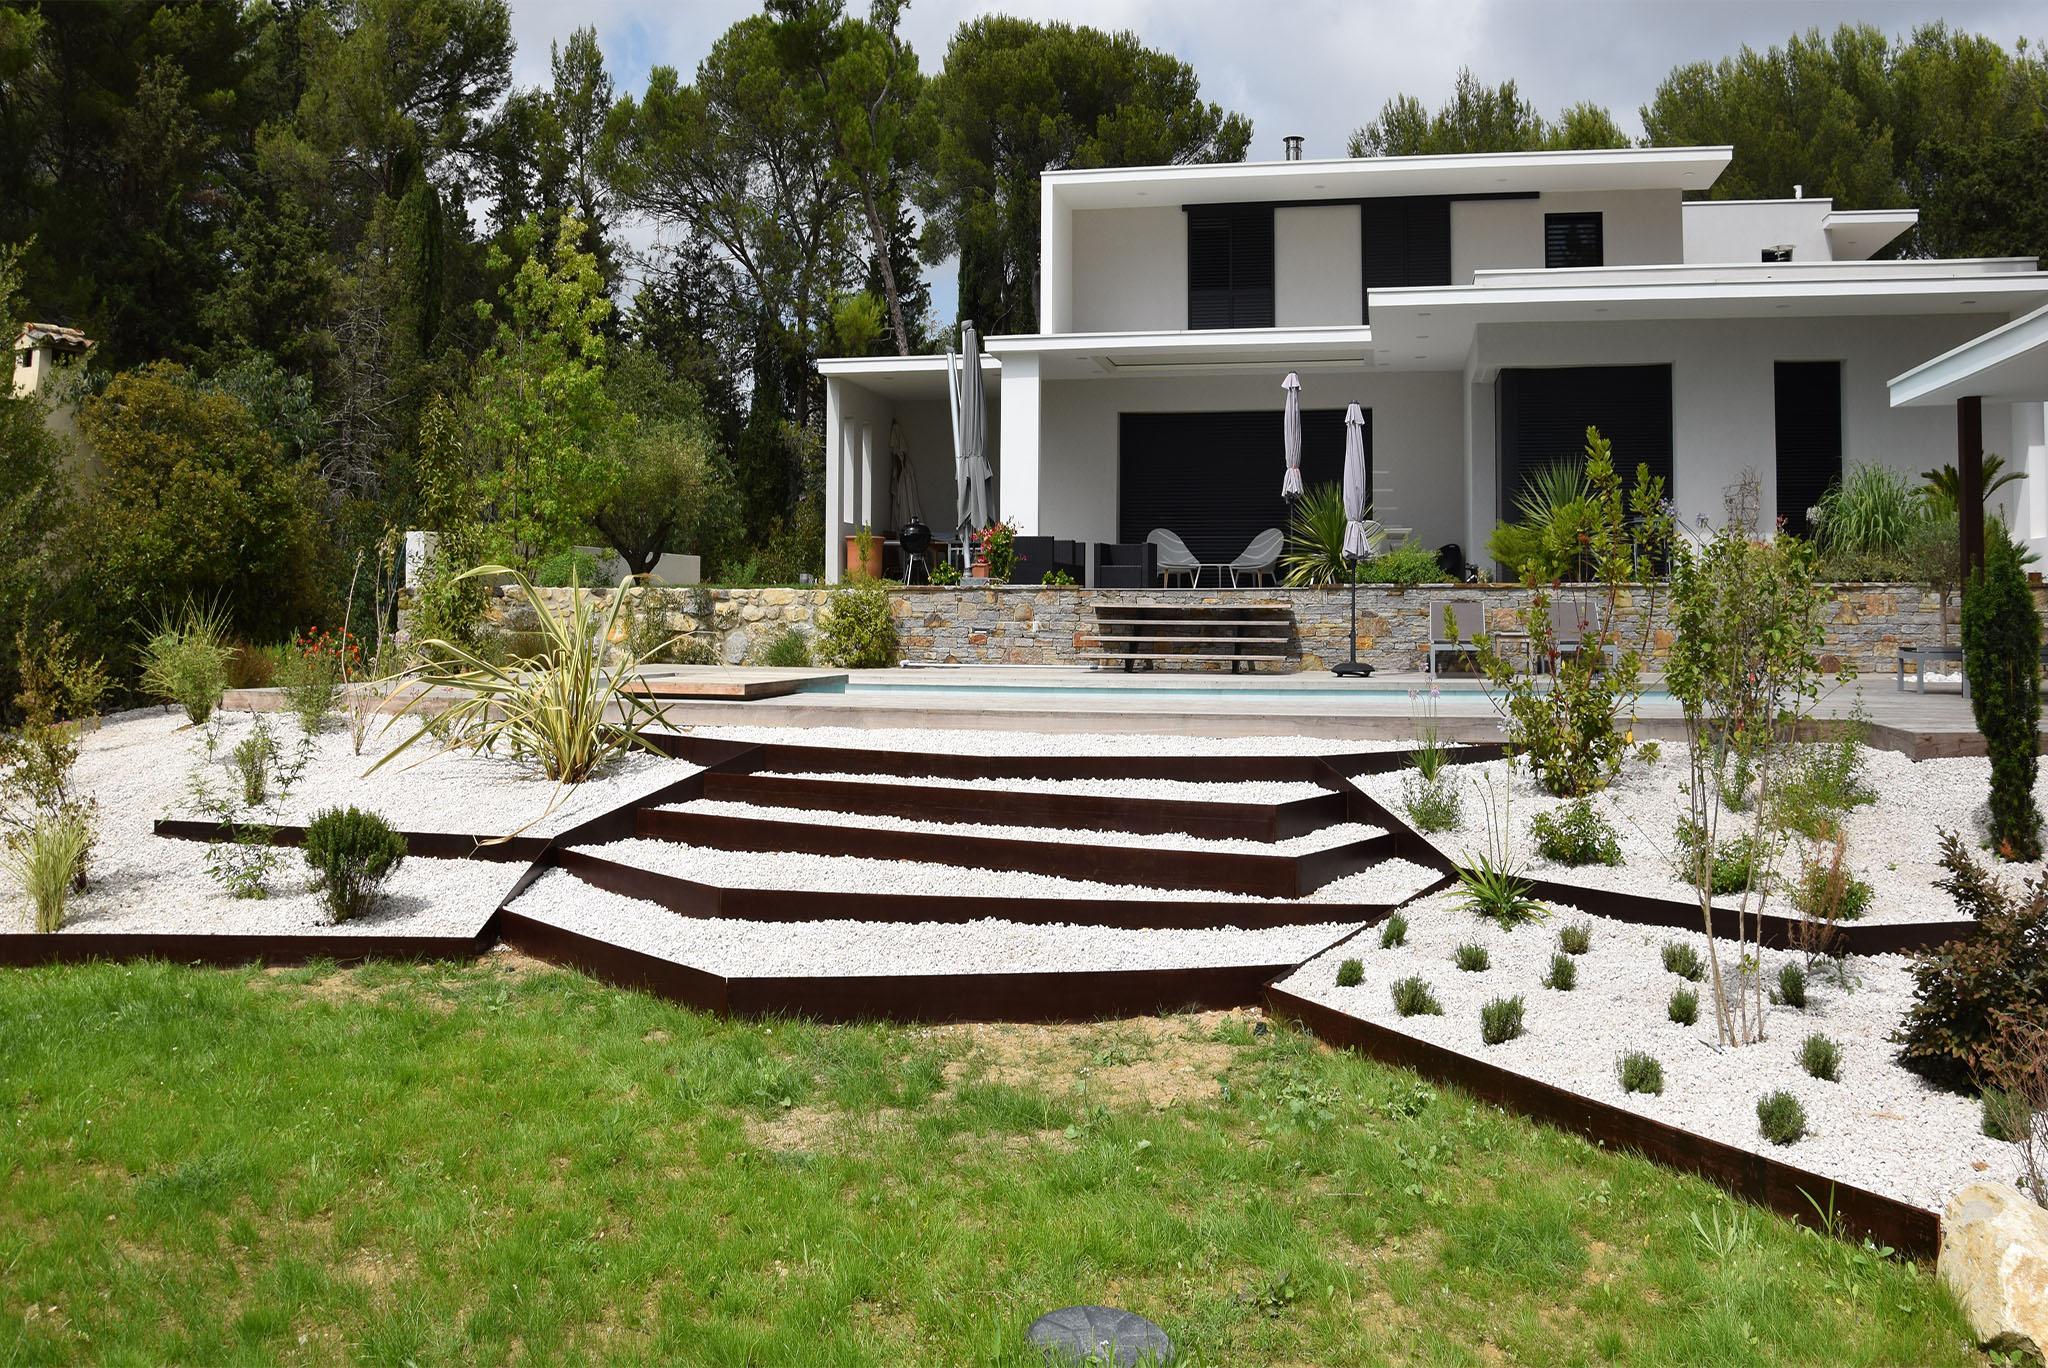 Paysagiste montpellier Amenagement jardin Decoration jardin